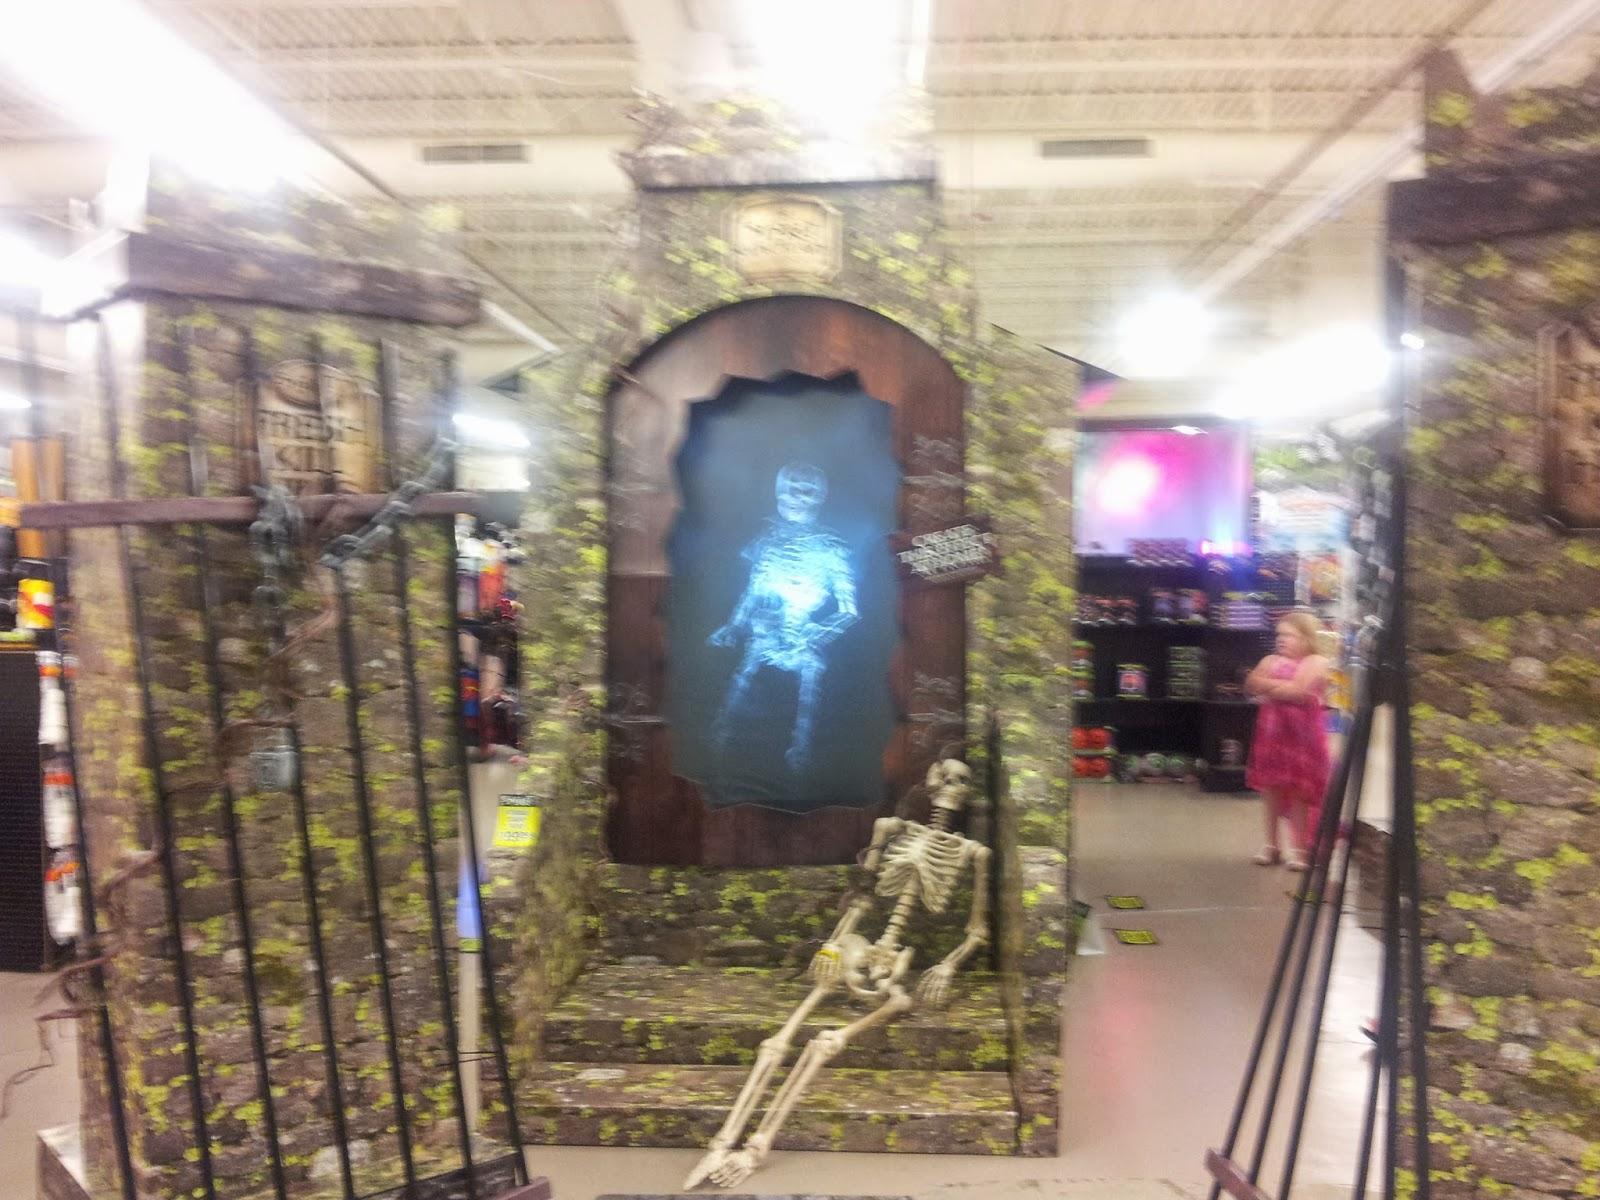 The misadventures of the halloweenut spirit halloween for Michaels crafts job application